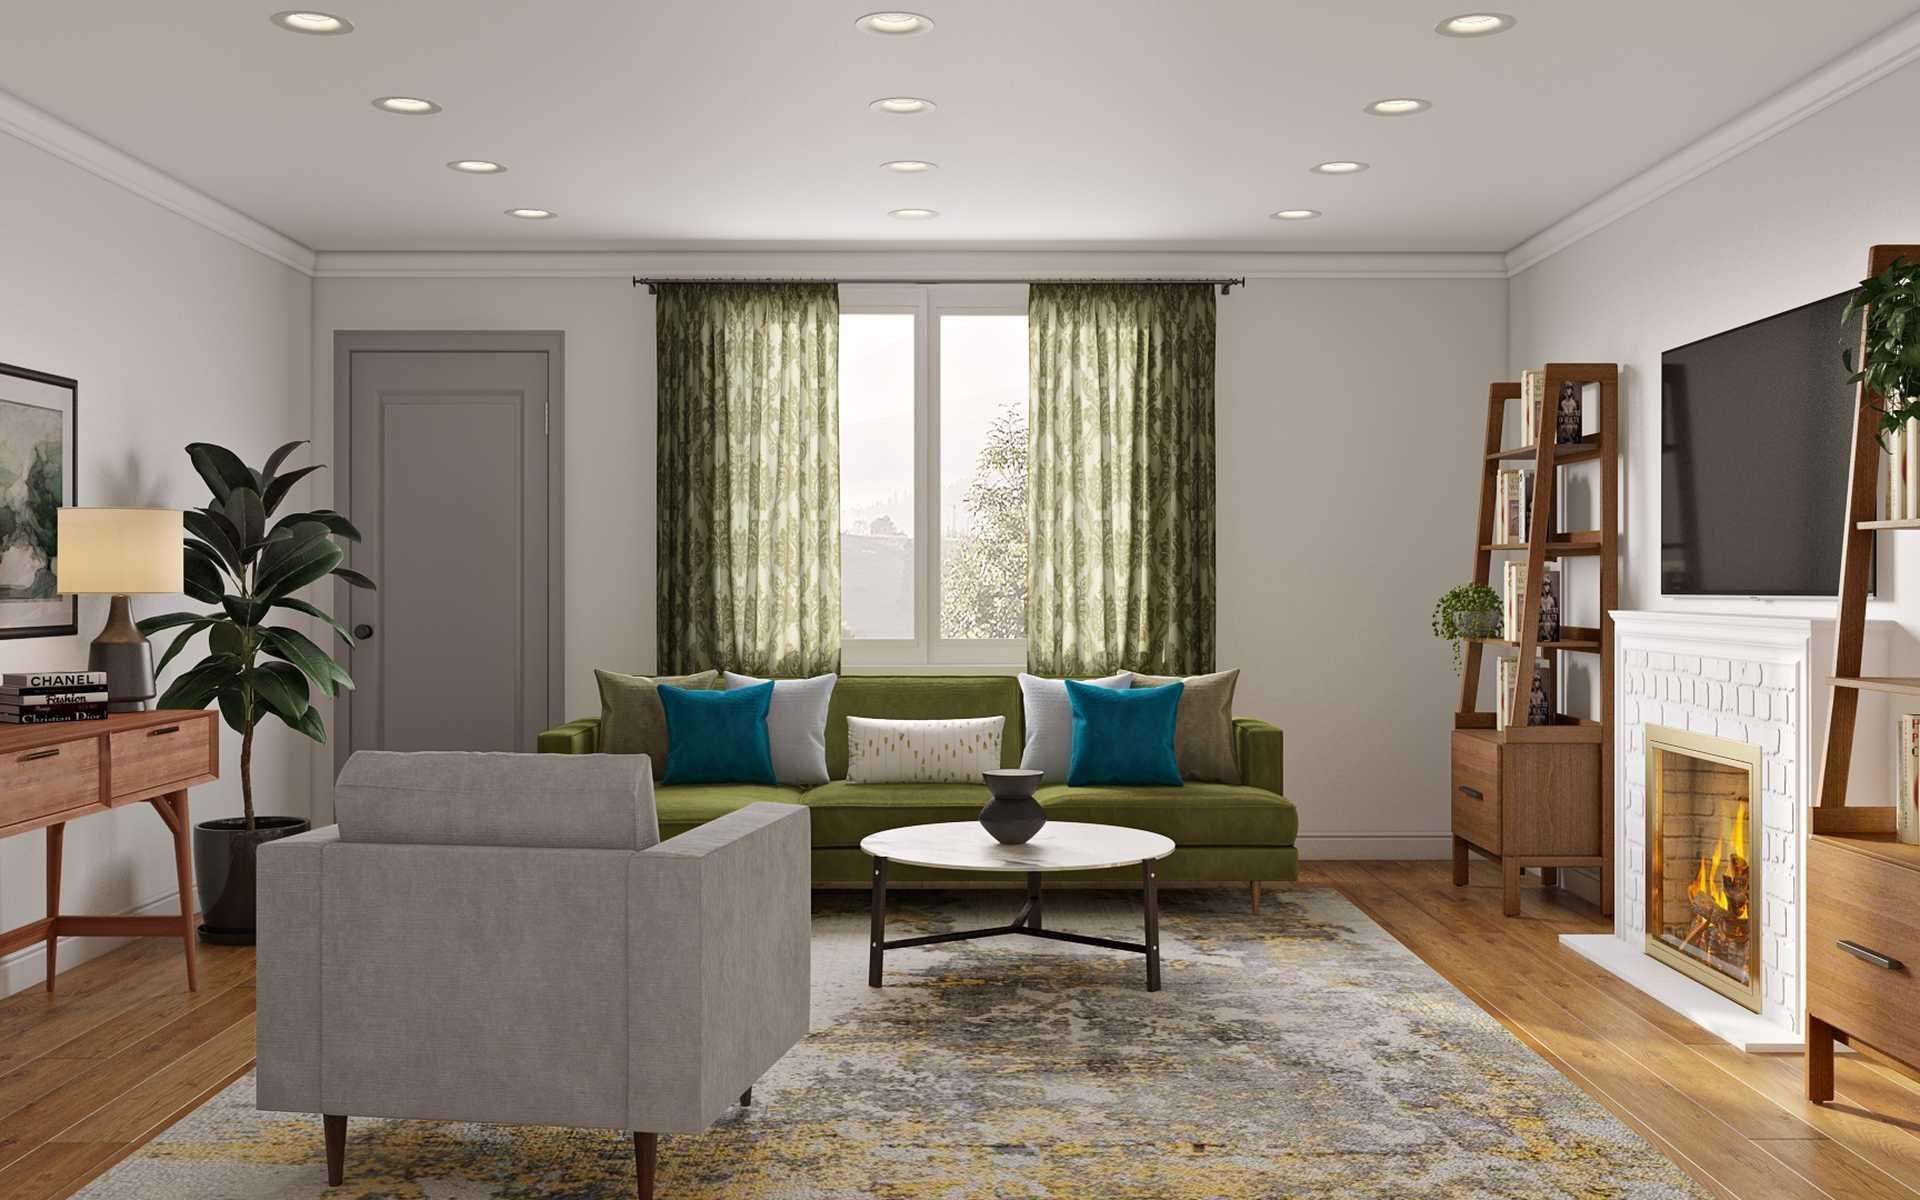 25 Living Room Interior Design Ideas Havenly Living Room Design Modern Modern Room Design Interior Design